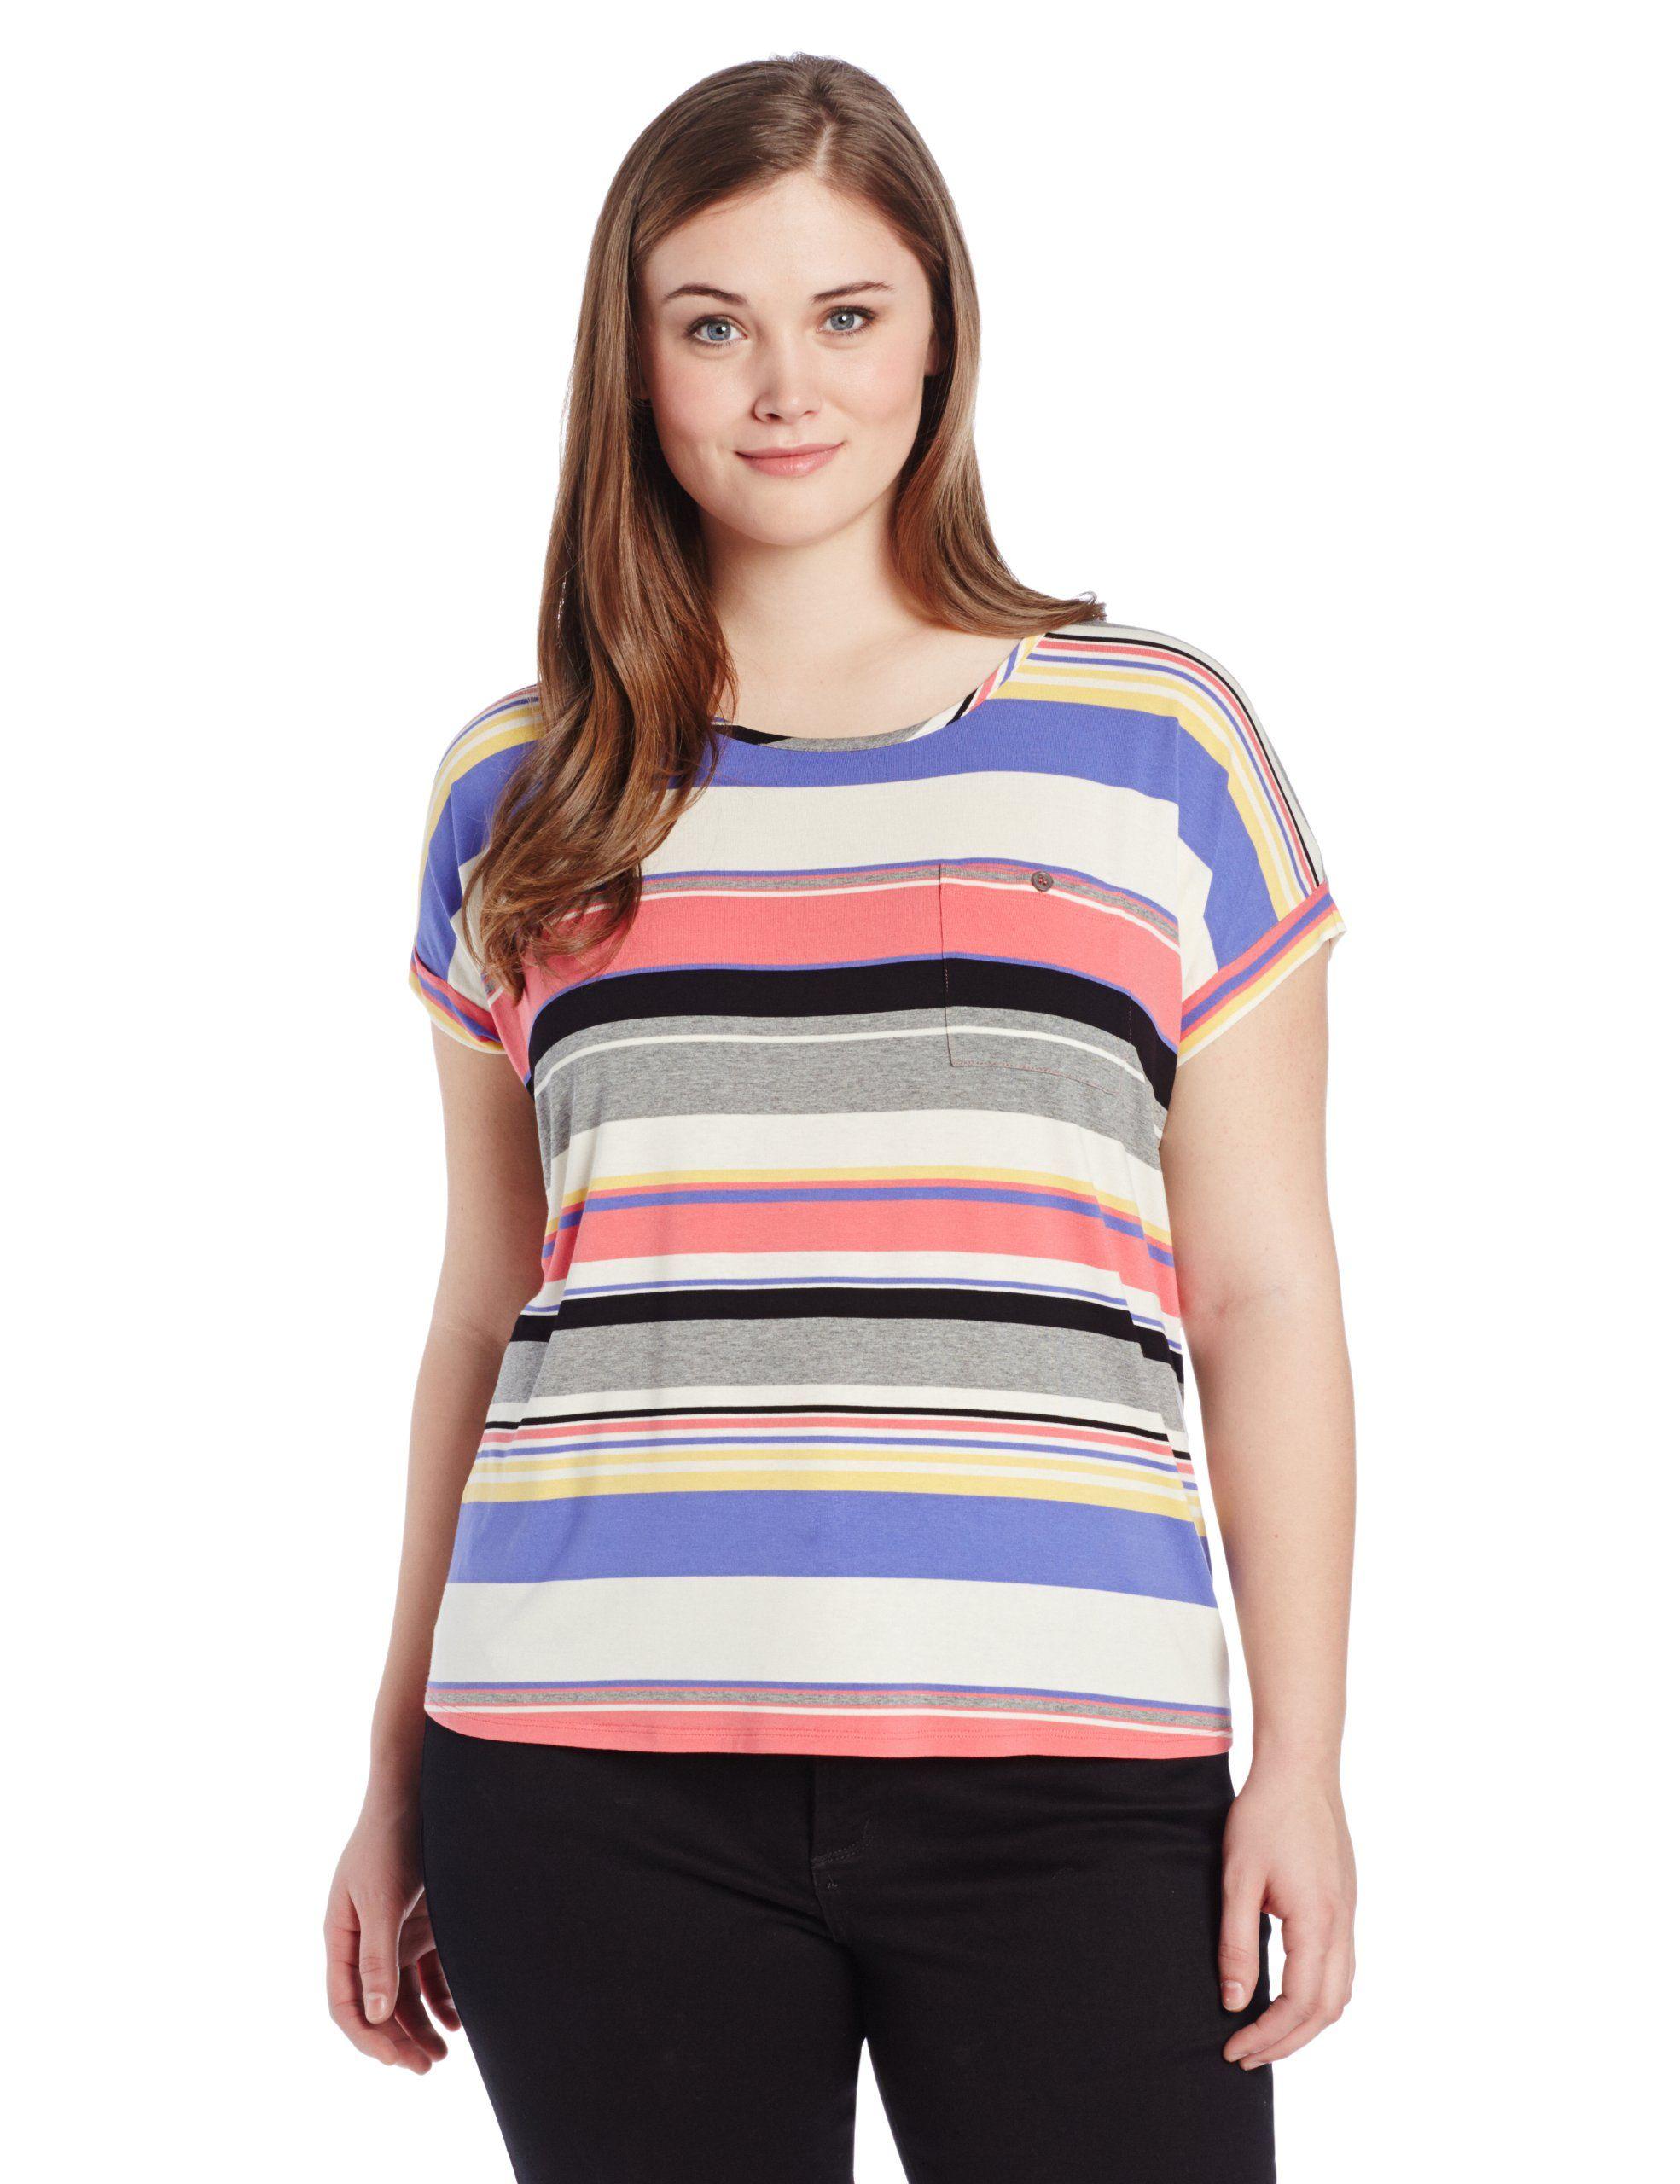 e73787d2 Two by Vince Camuto Women's Plus-Size Happy Stripe Pocket Tee Plus, Granita  Pink, 3X